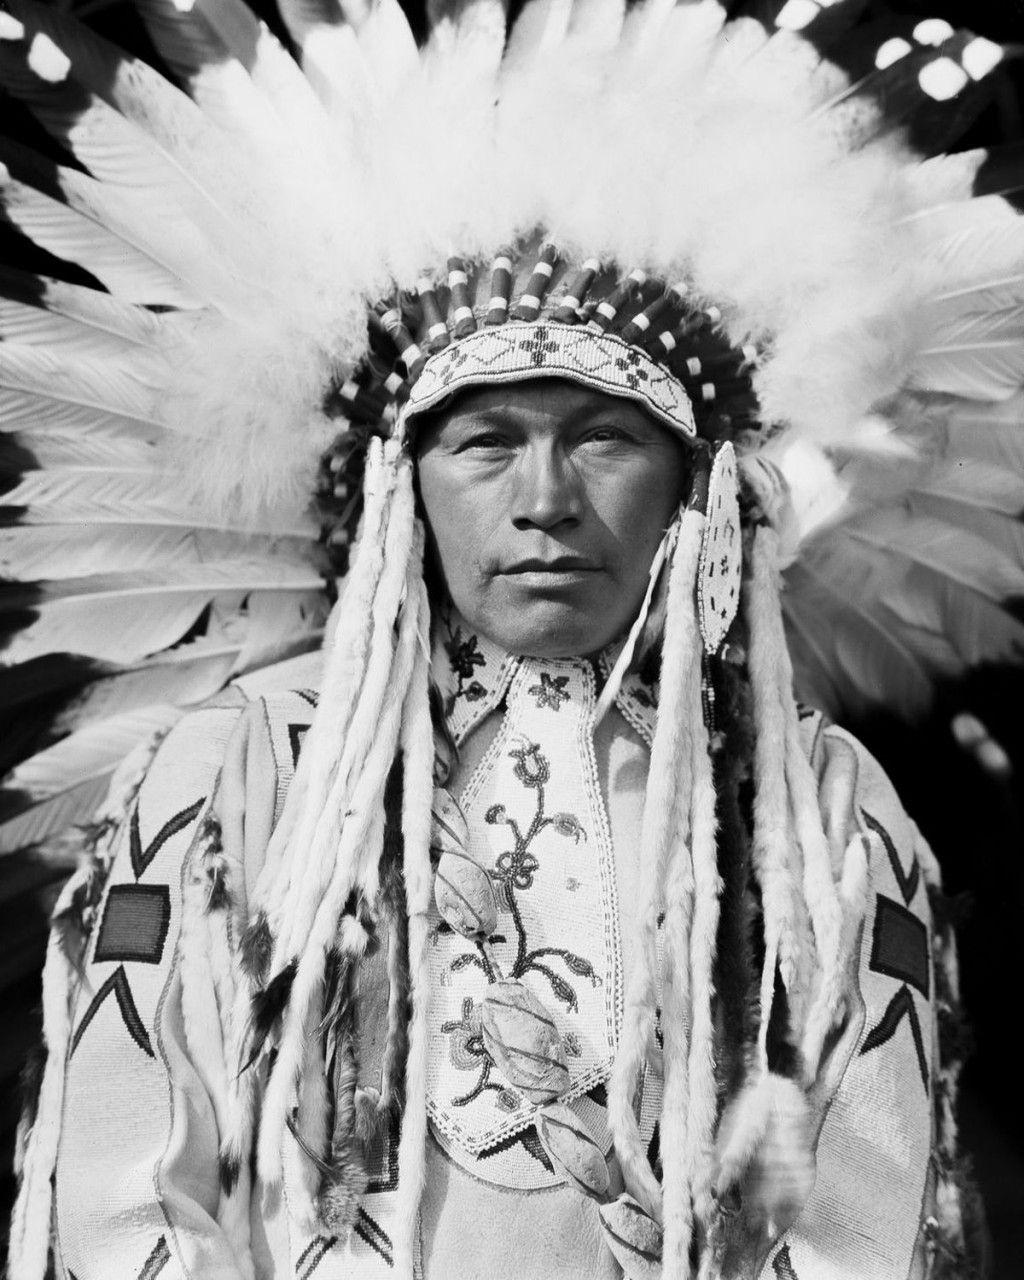 чёлка, уложенная фото племен индейцев америки японцы